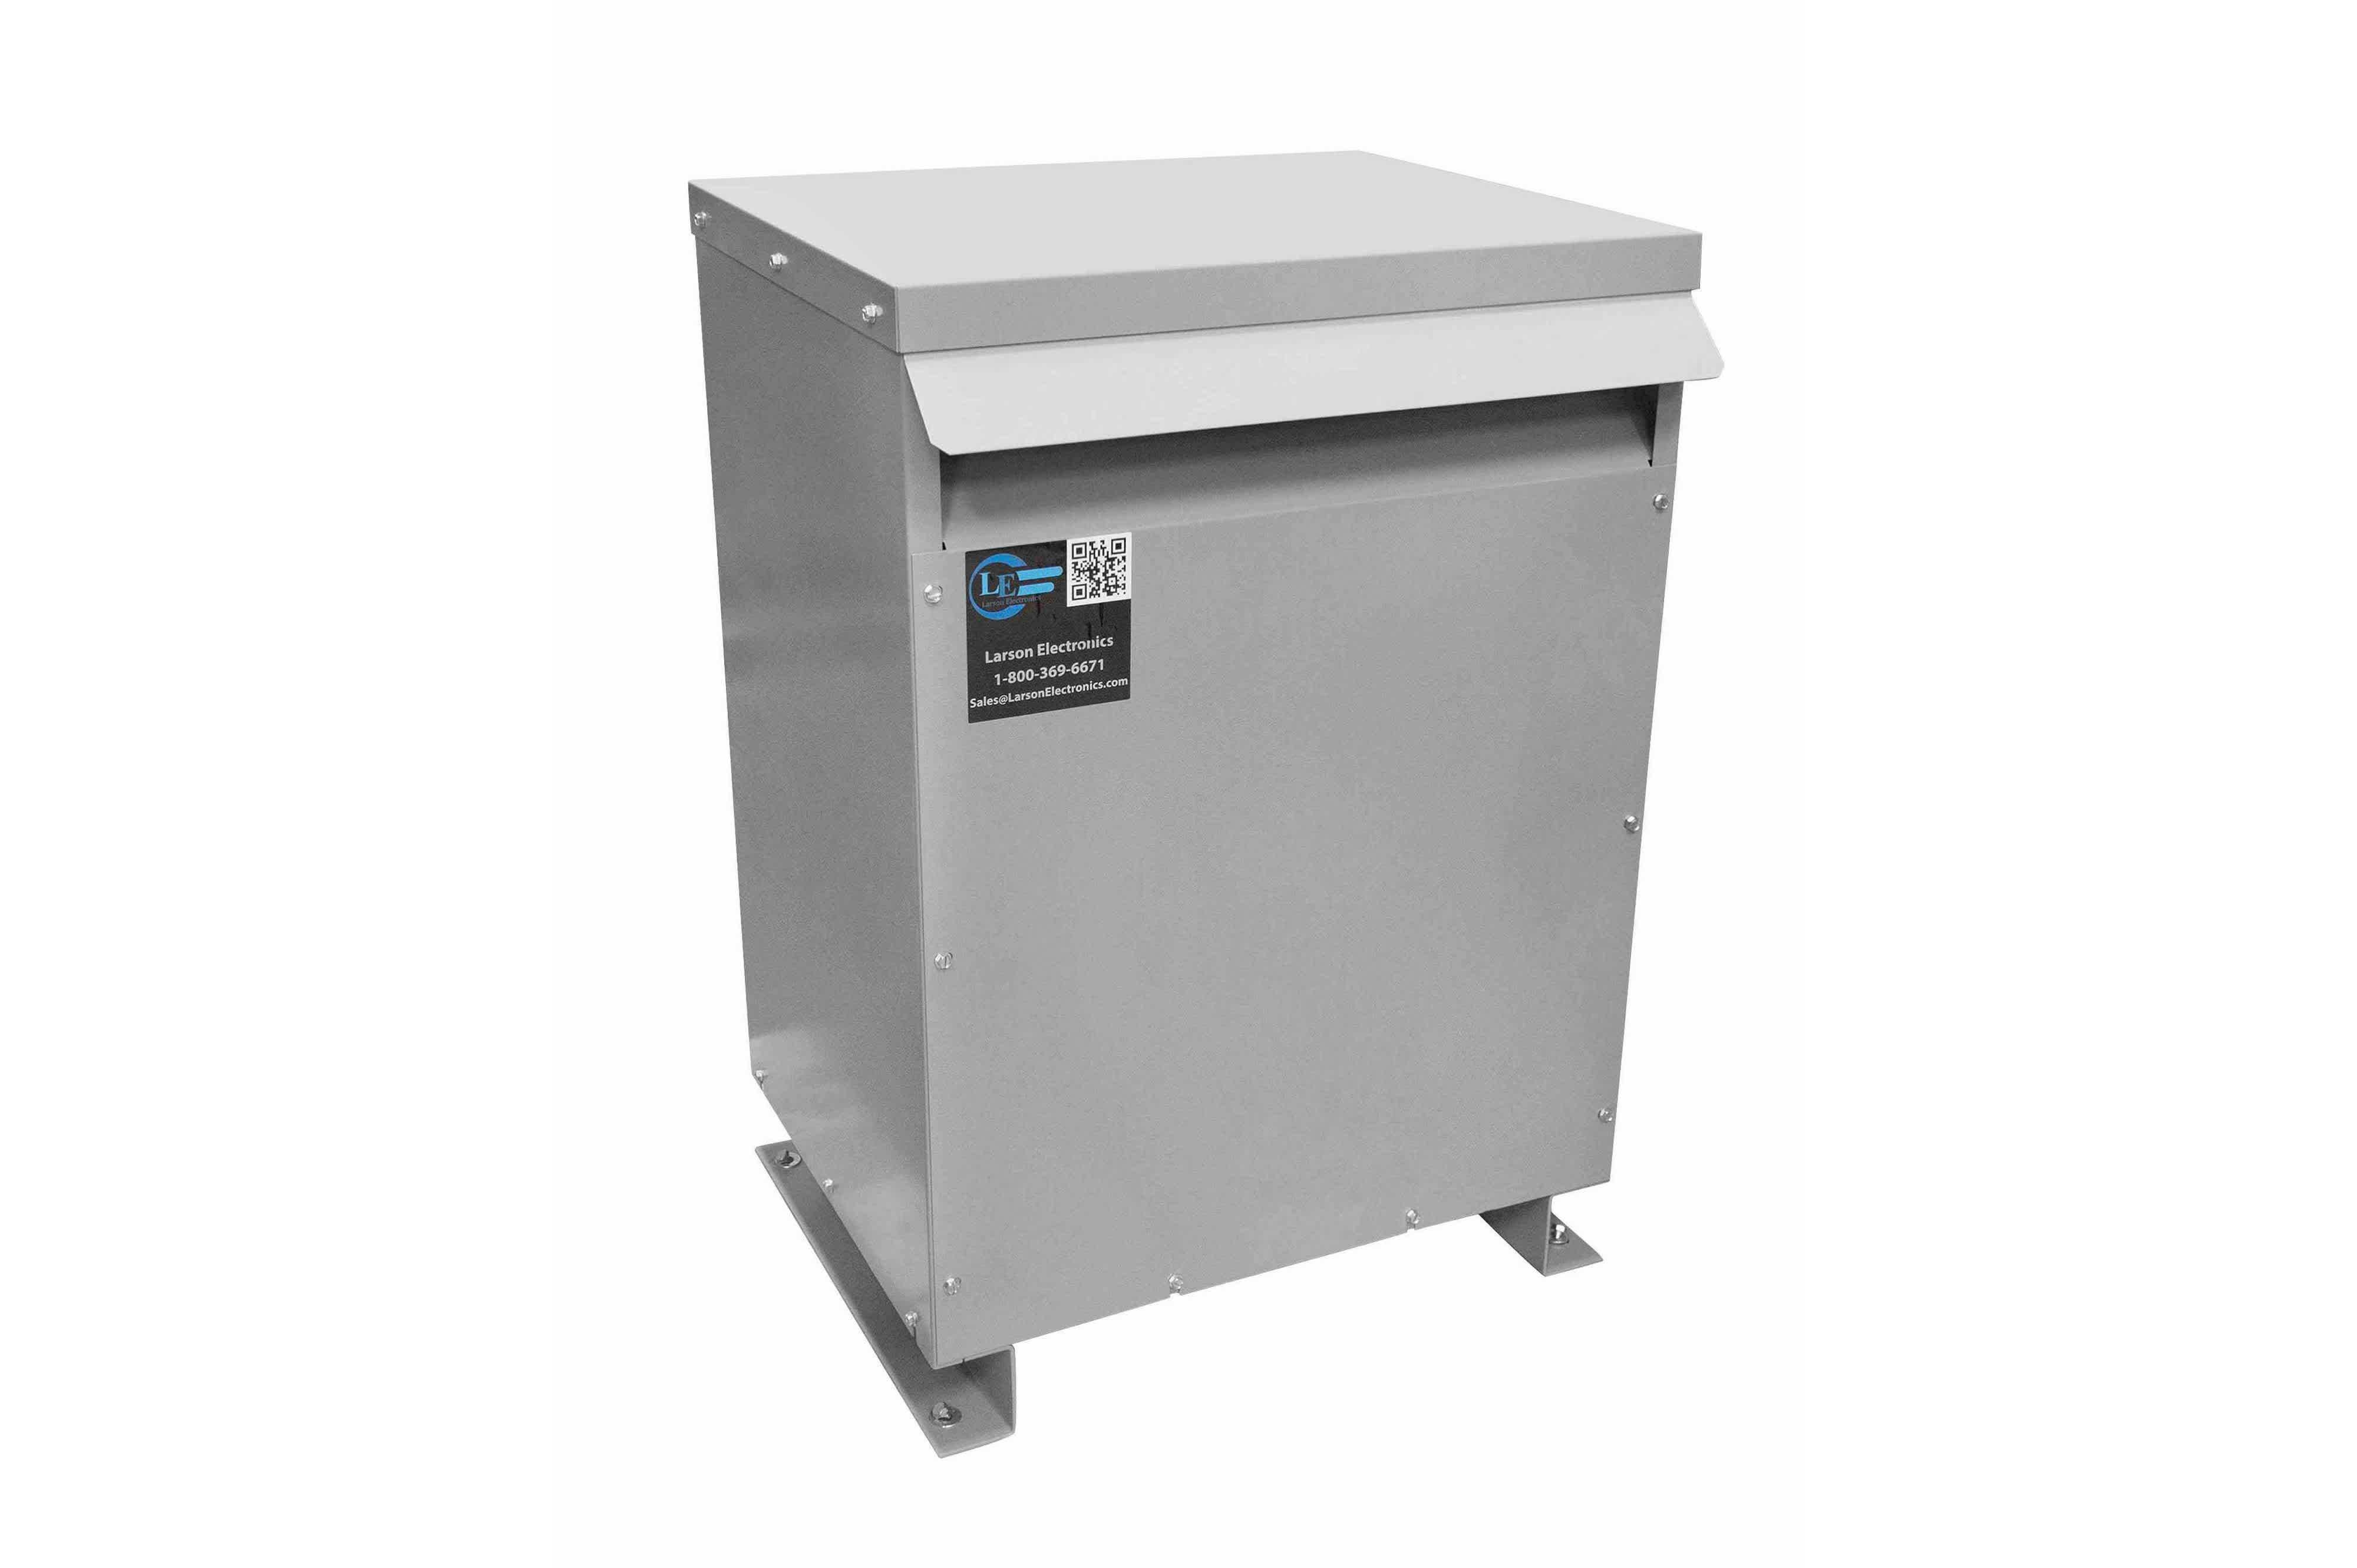 60 kVA 3PH Isolation Transformer, 460V Wye Primary, 380V Delta Secondary, N3R, Ventilated, 60 Hz